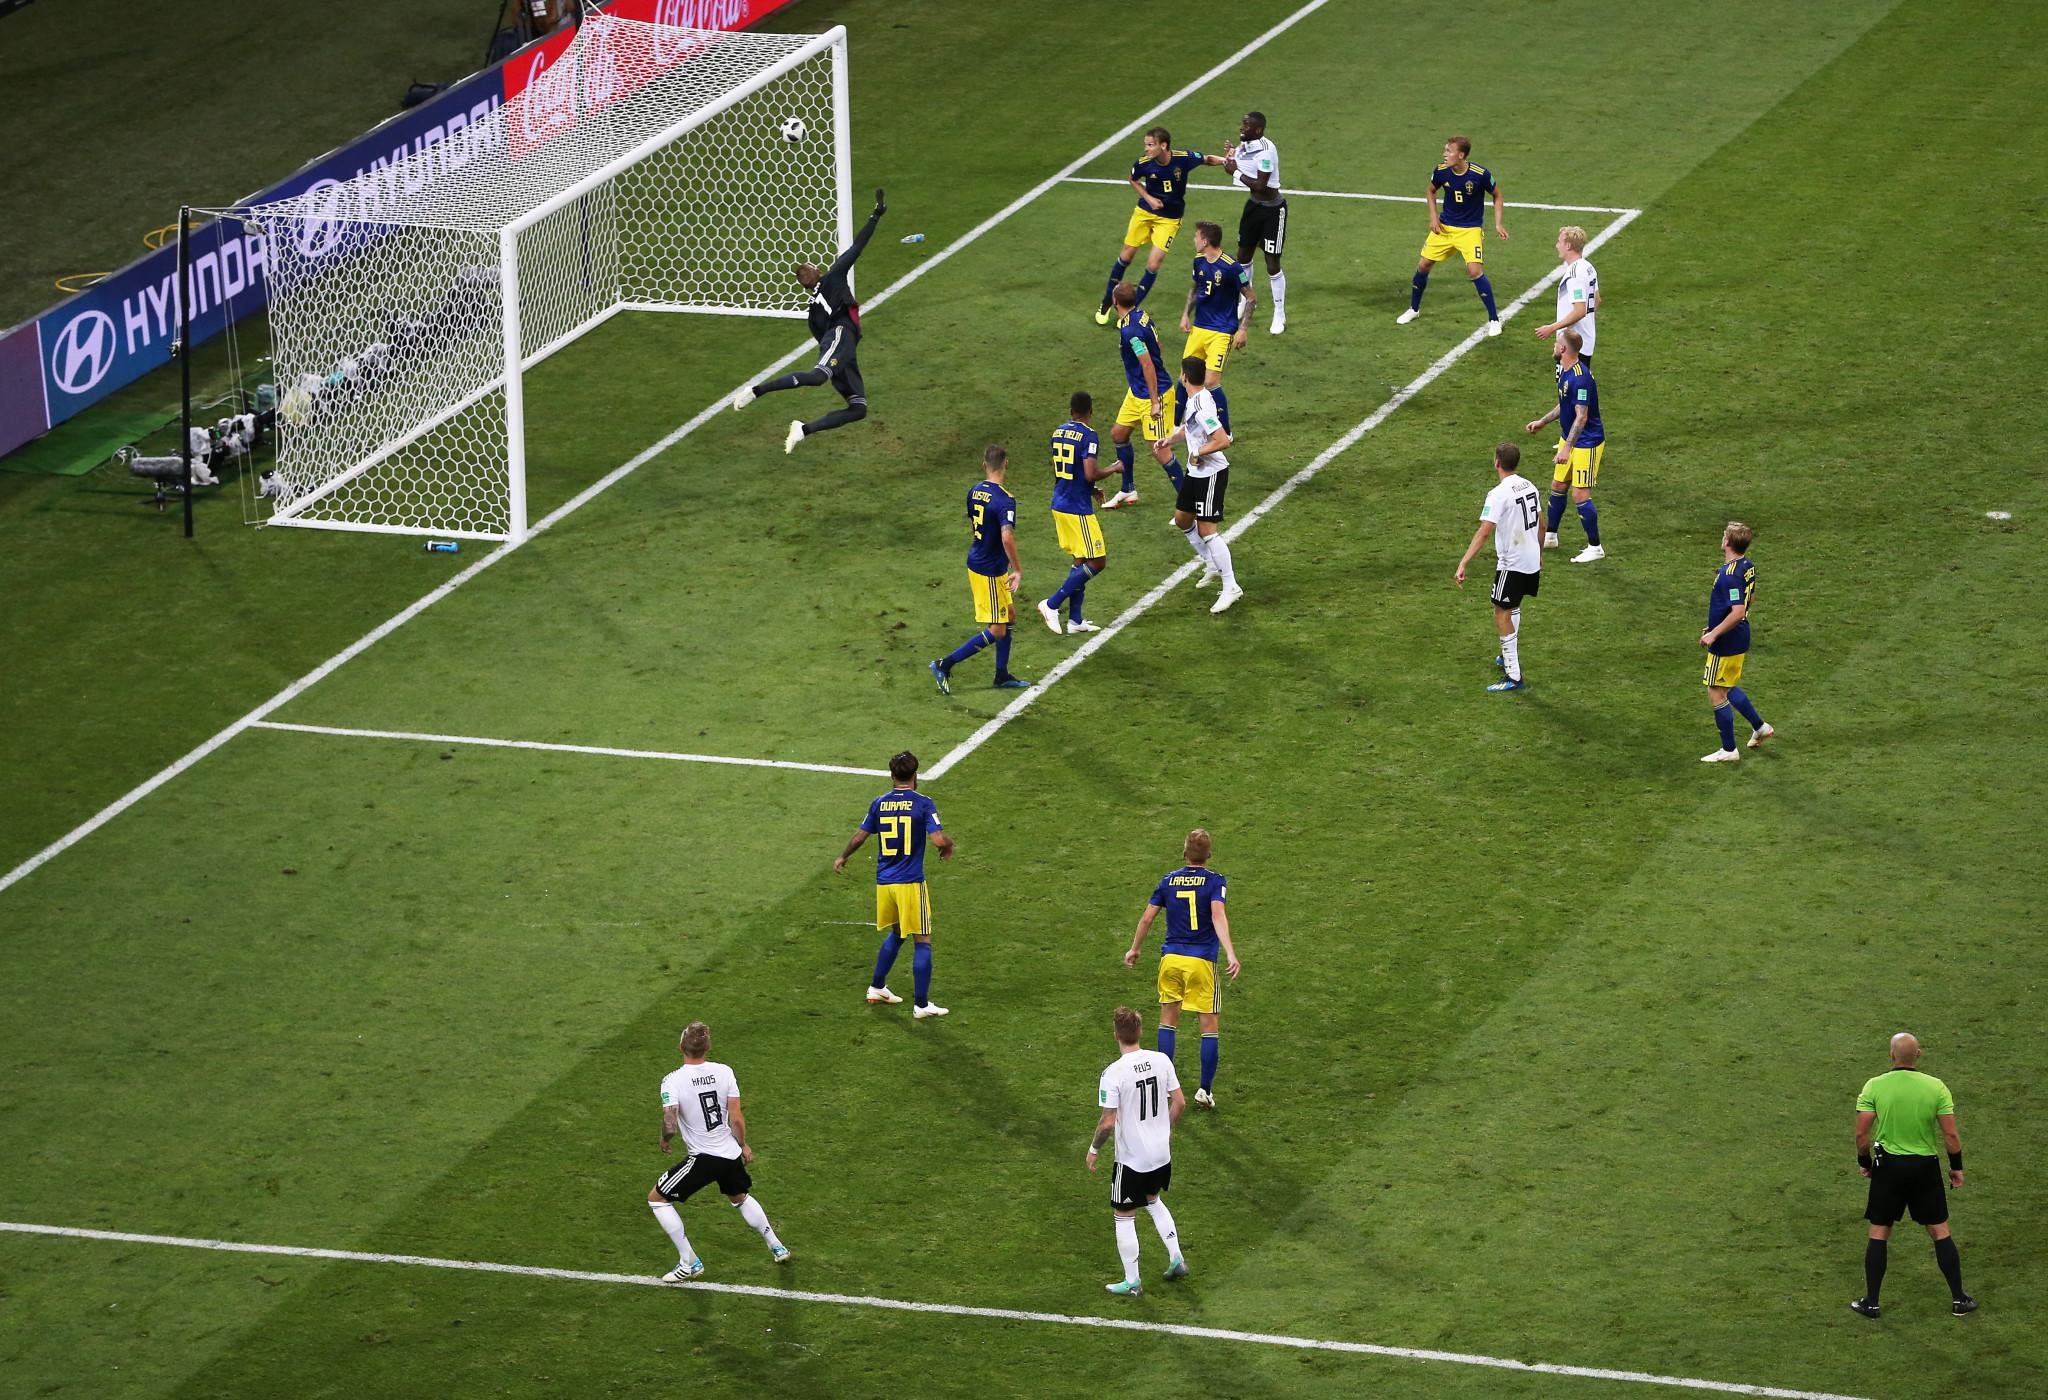 Kroos missile sinks Sweden to keep German hopes of defending FIFA World Cup title alive